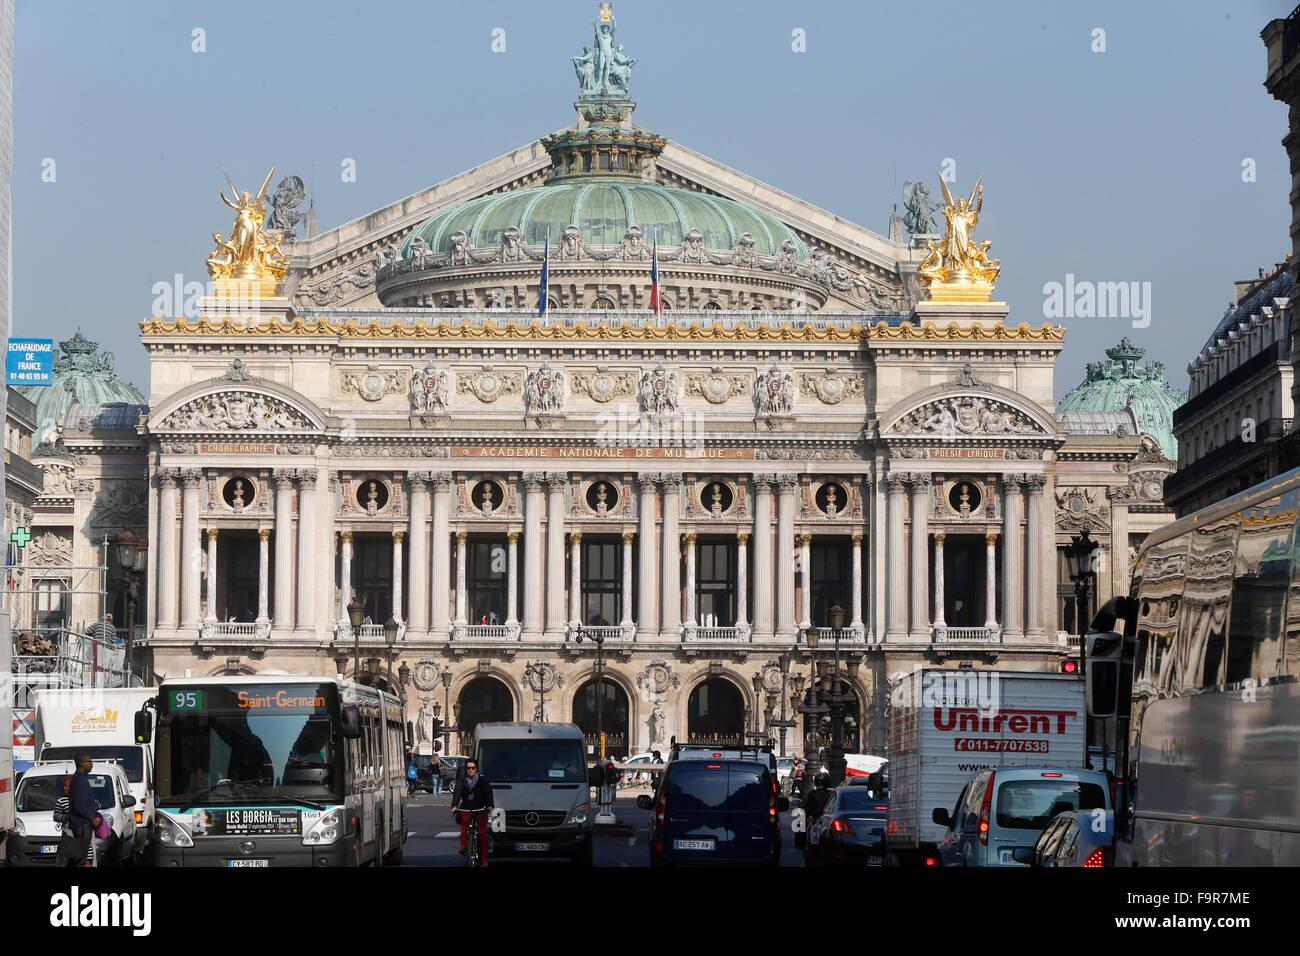 Palais Garnier. Paris Opera. - Stock Image